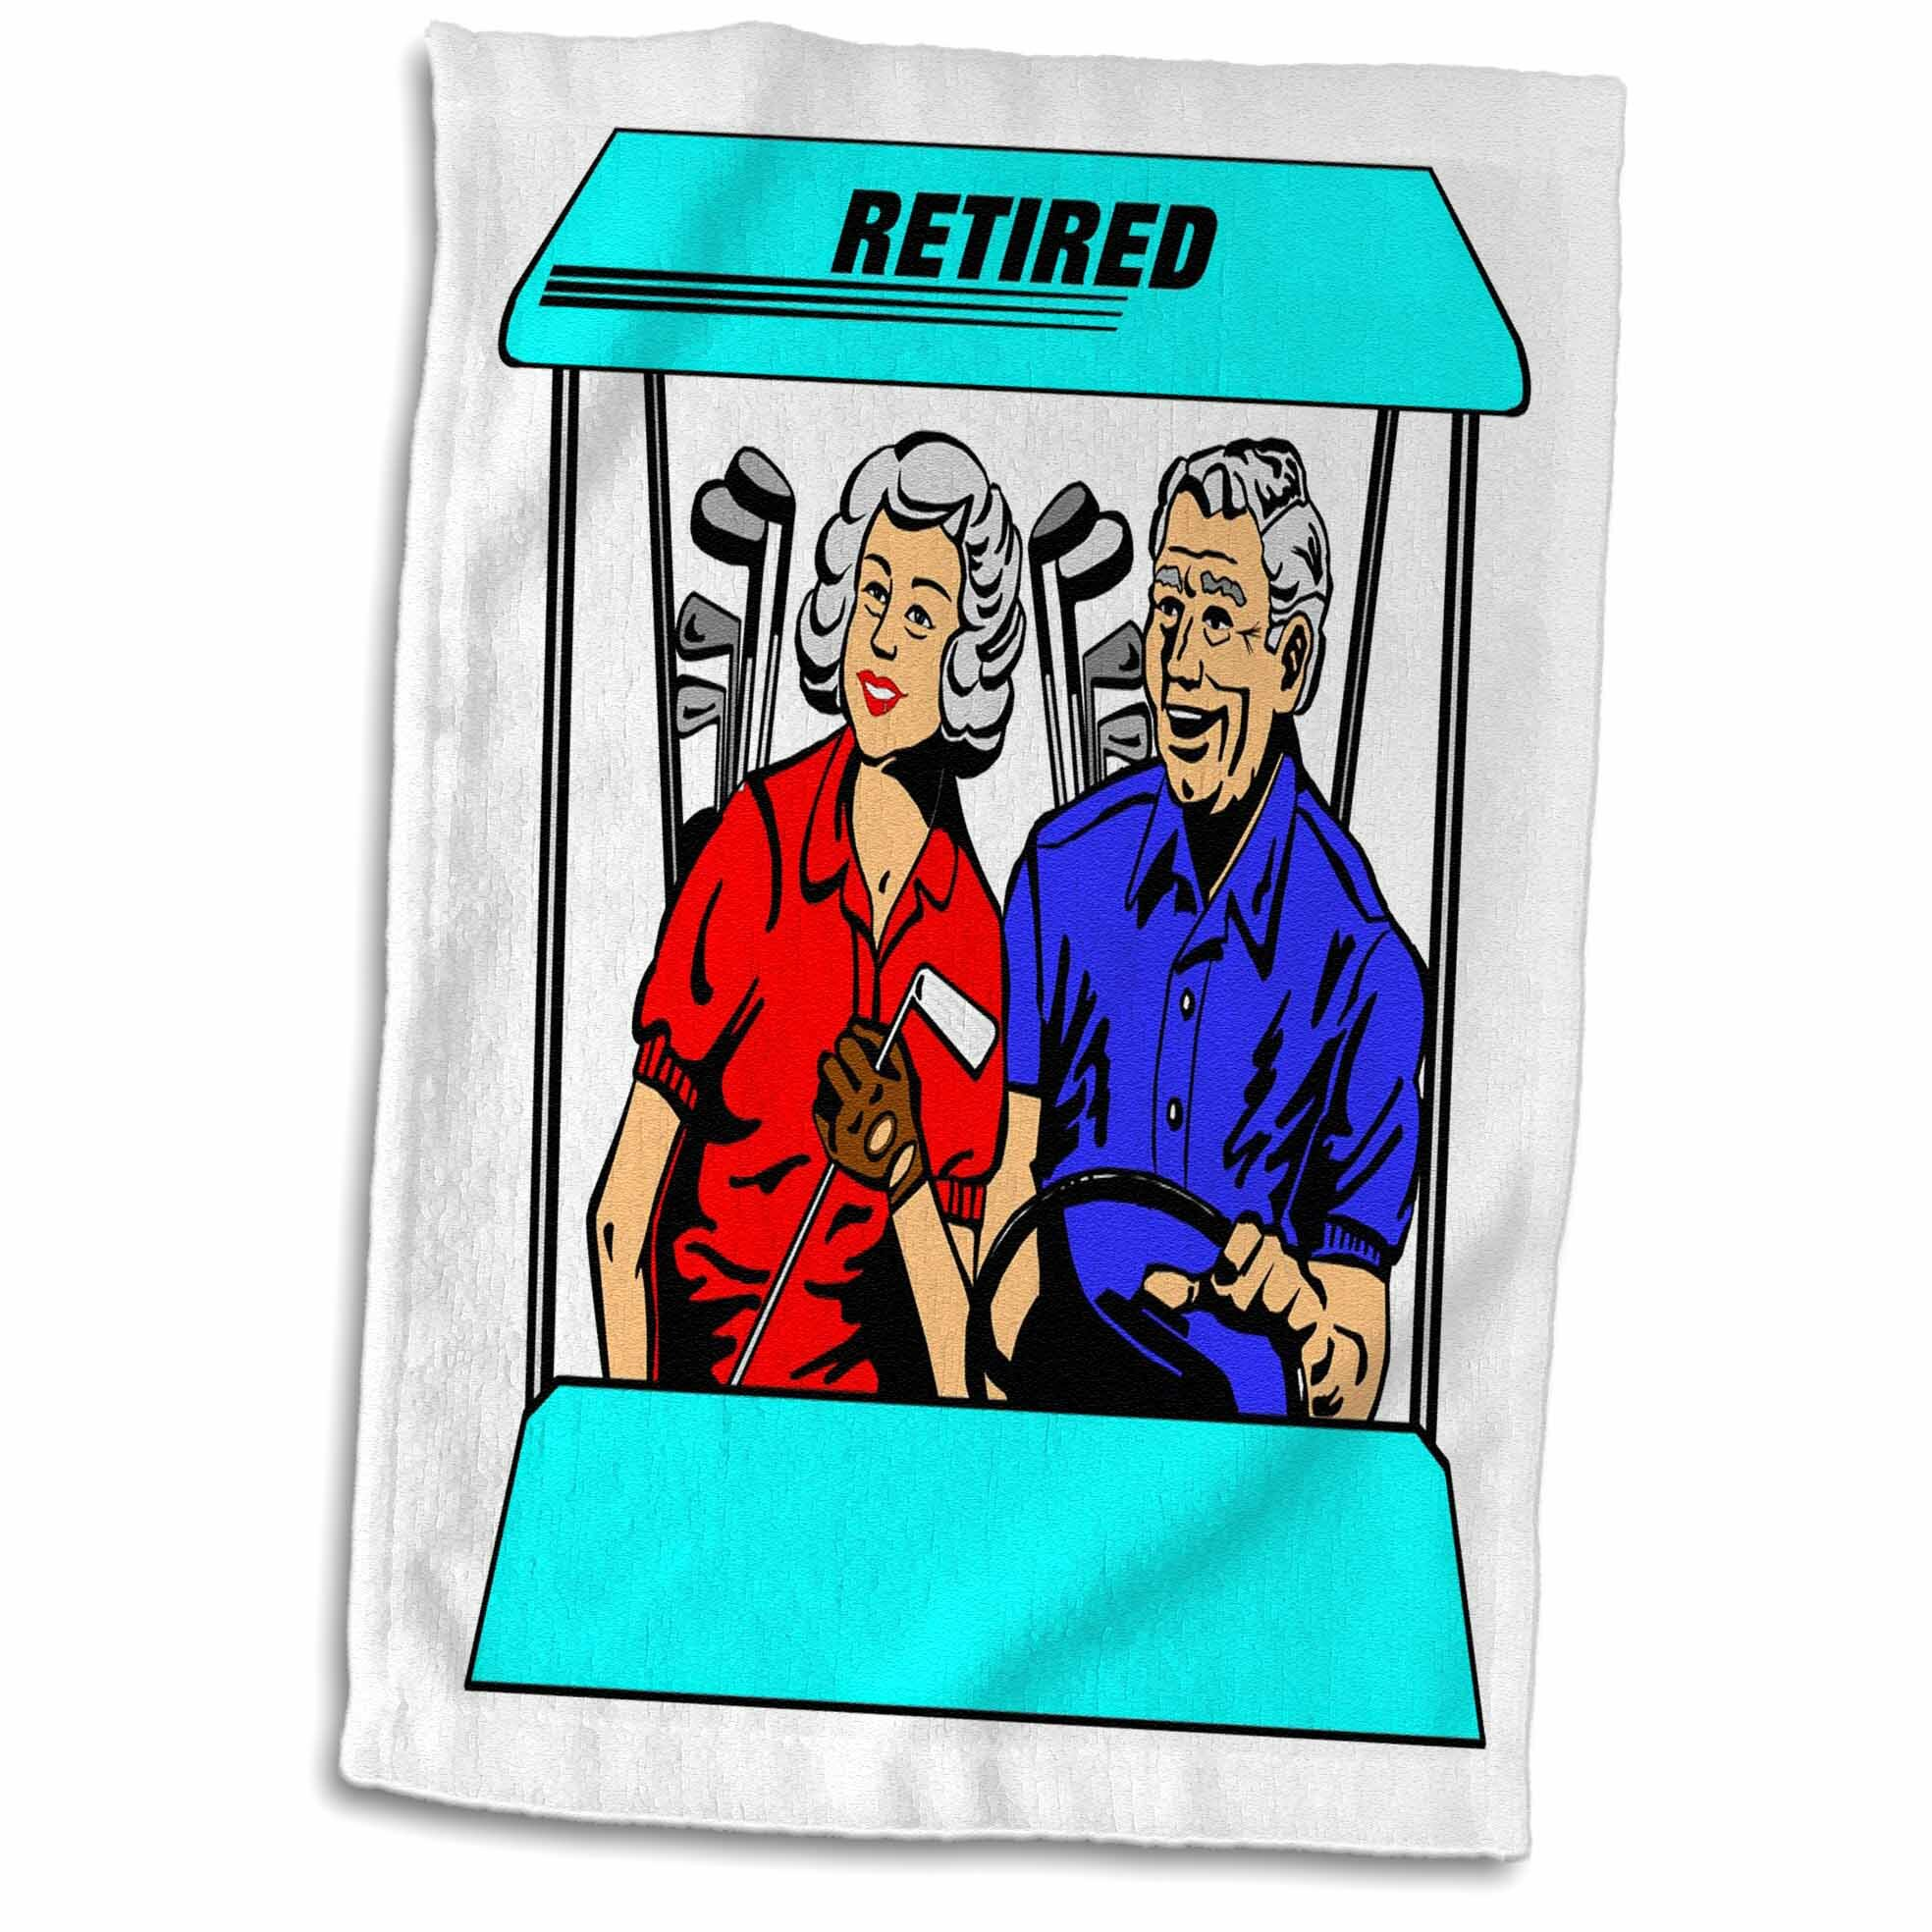 Symple Stuff Kight Cute Cartoon Couple In Golf Cart And Word Retired Hand Towel Wayfair